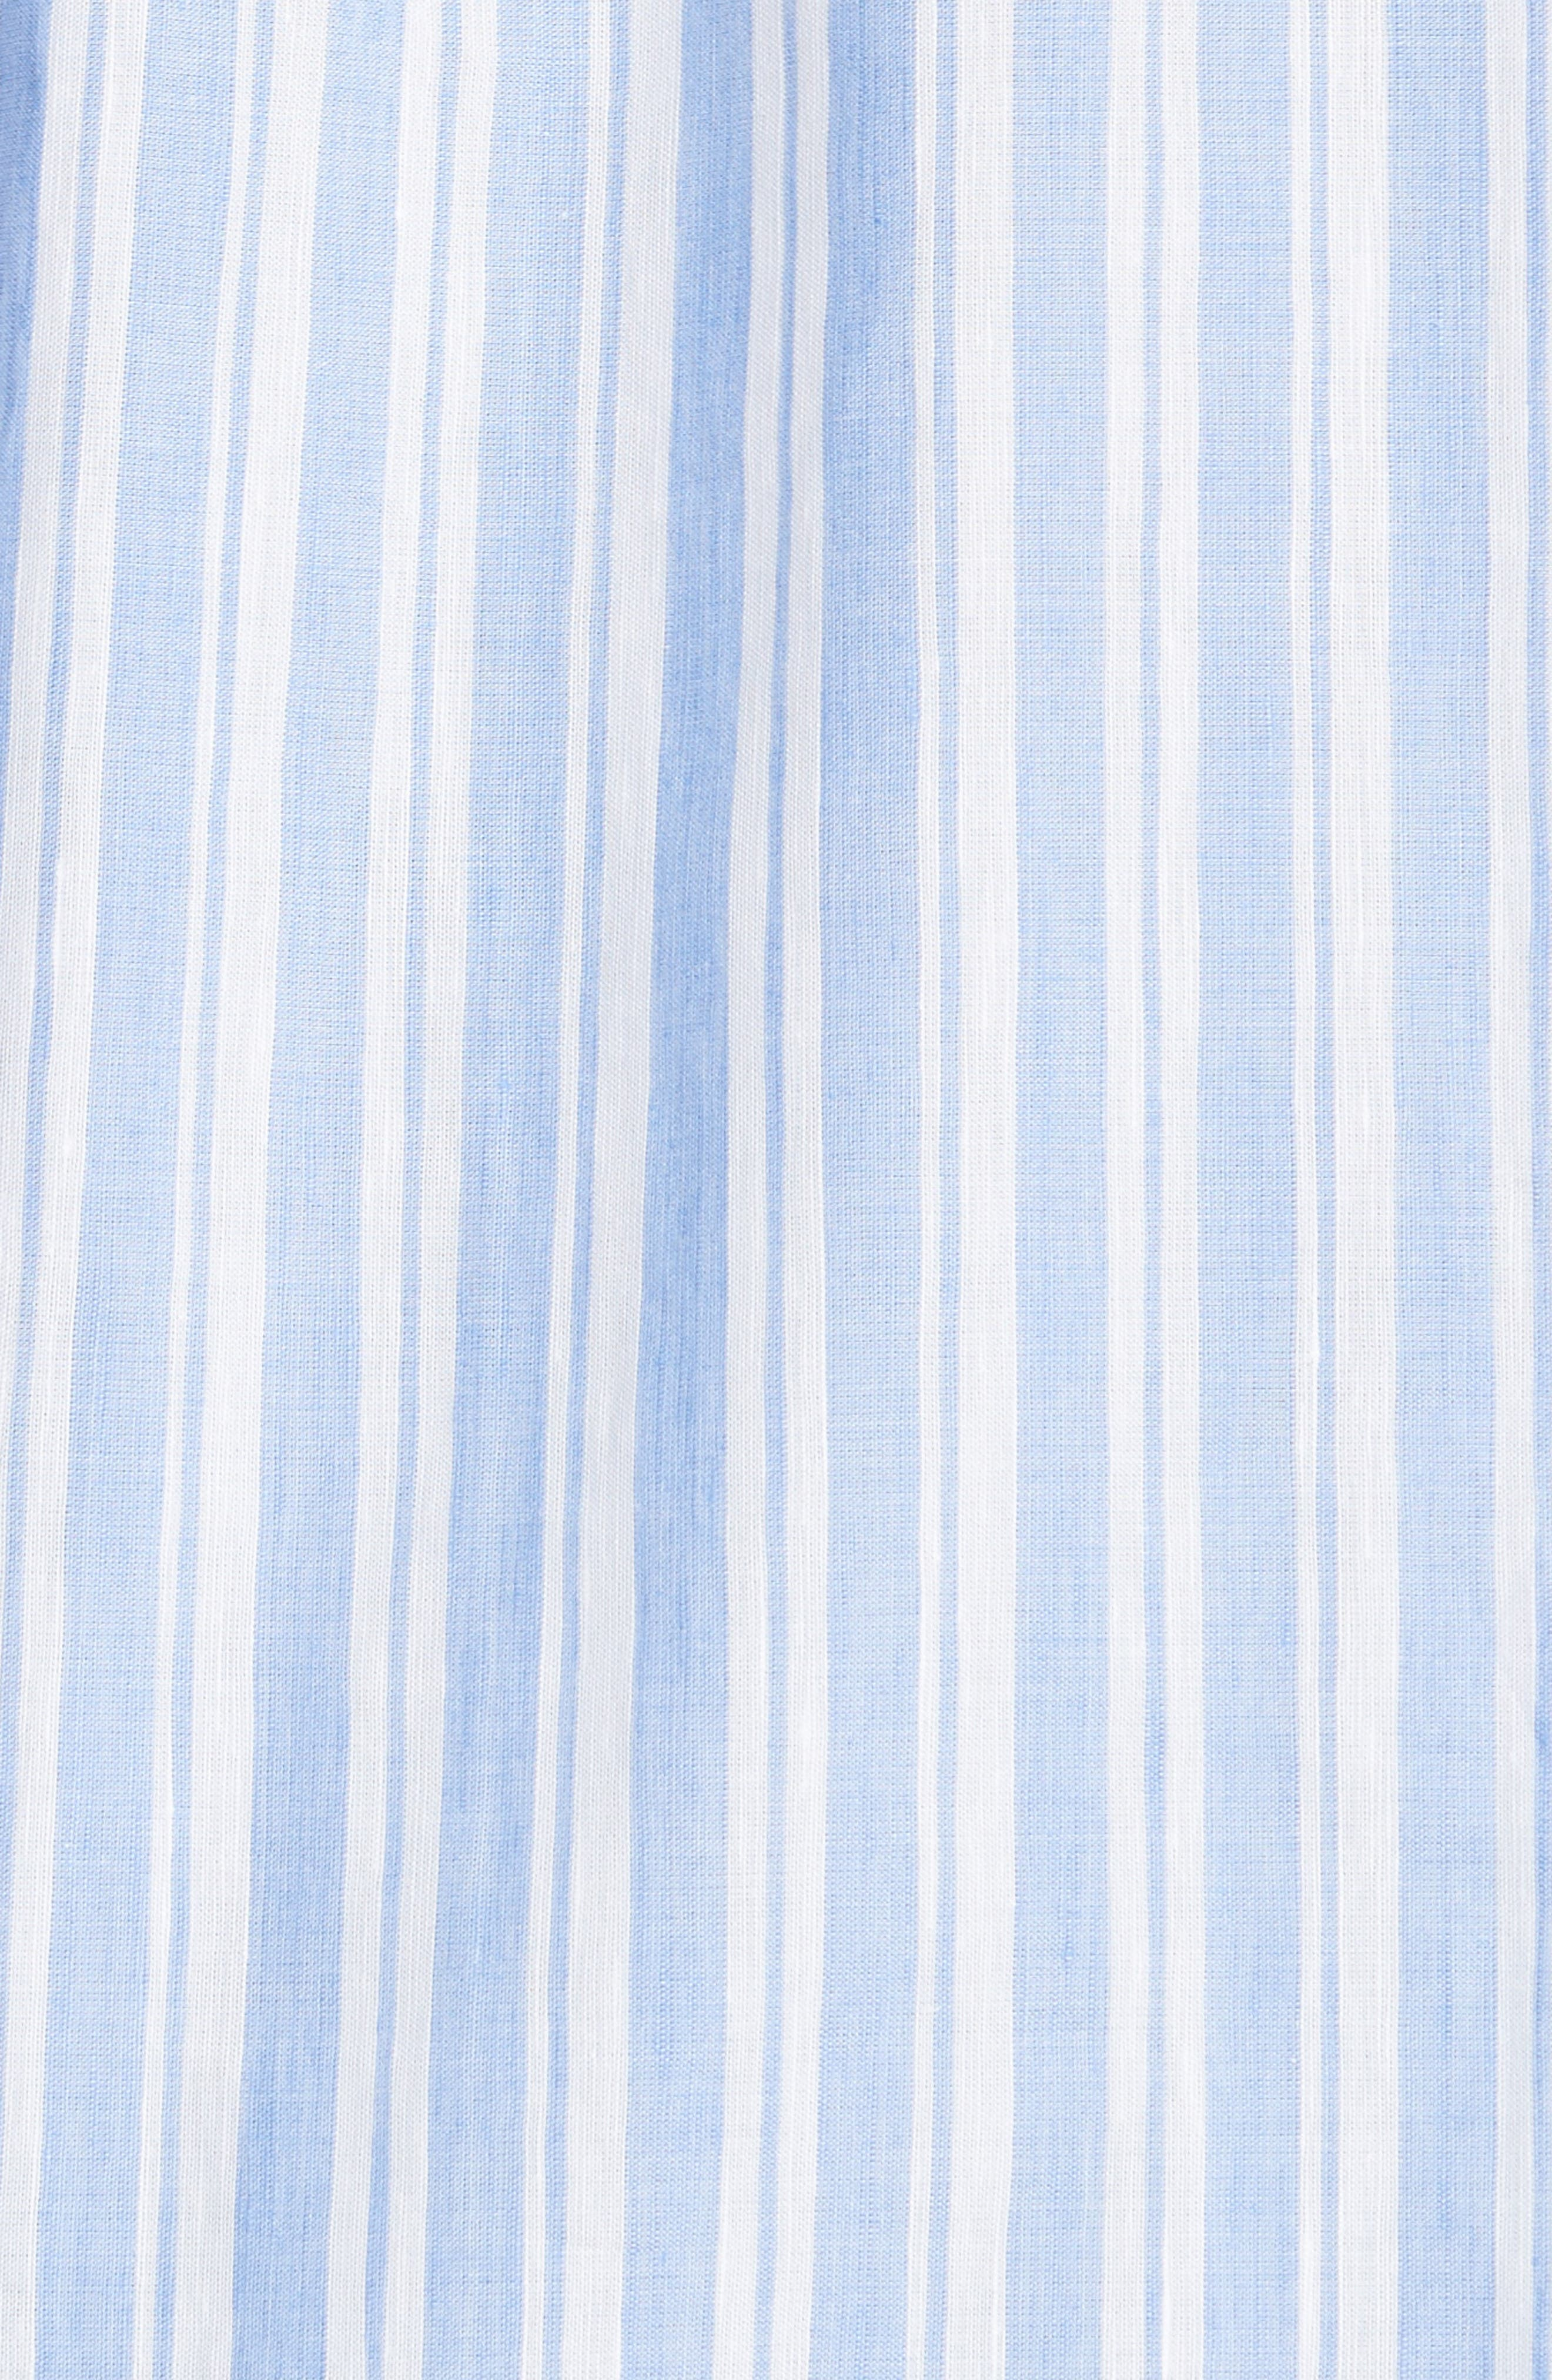 Oversized Stripe Chambray Shirt,                             Alternate thumbnail 5, color,                             460